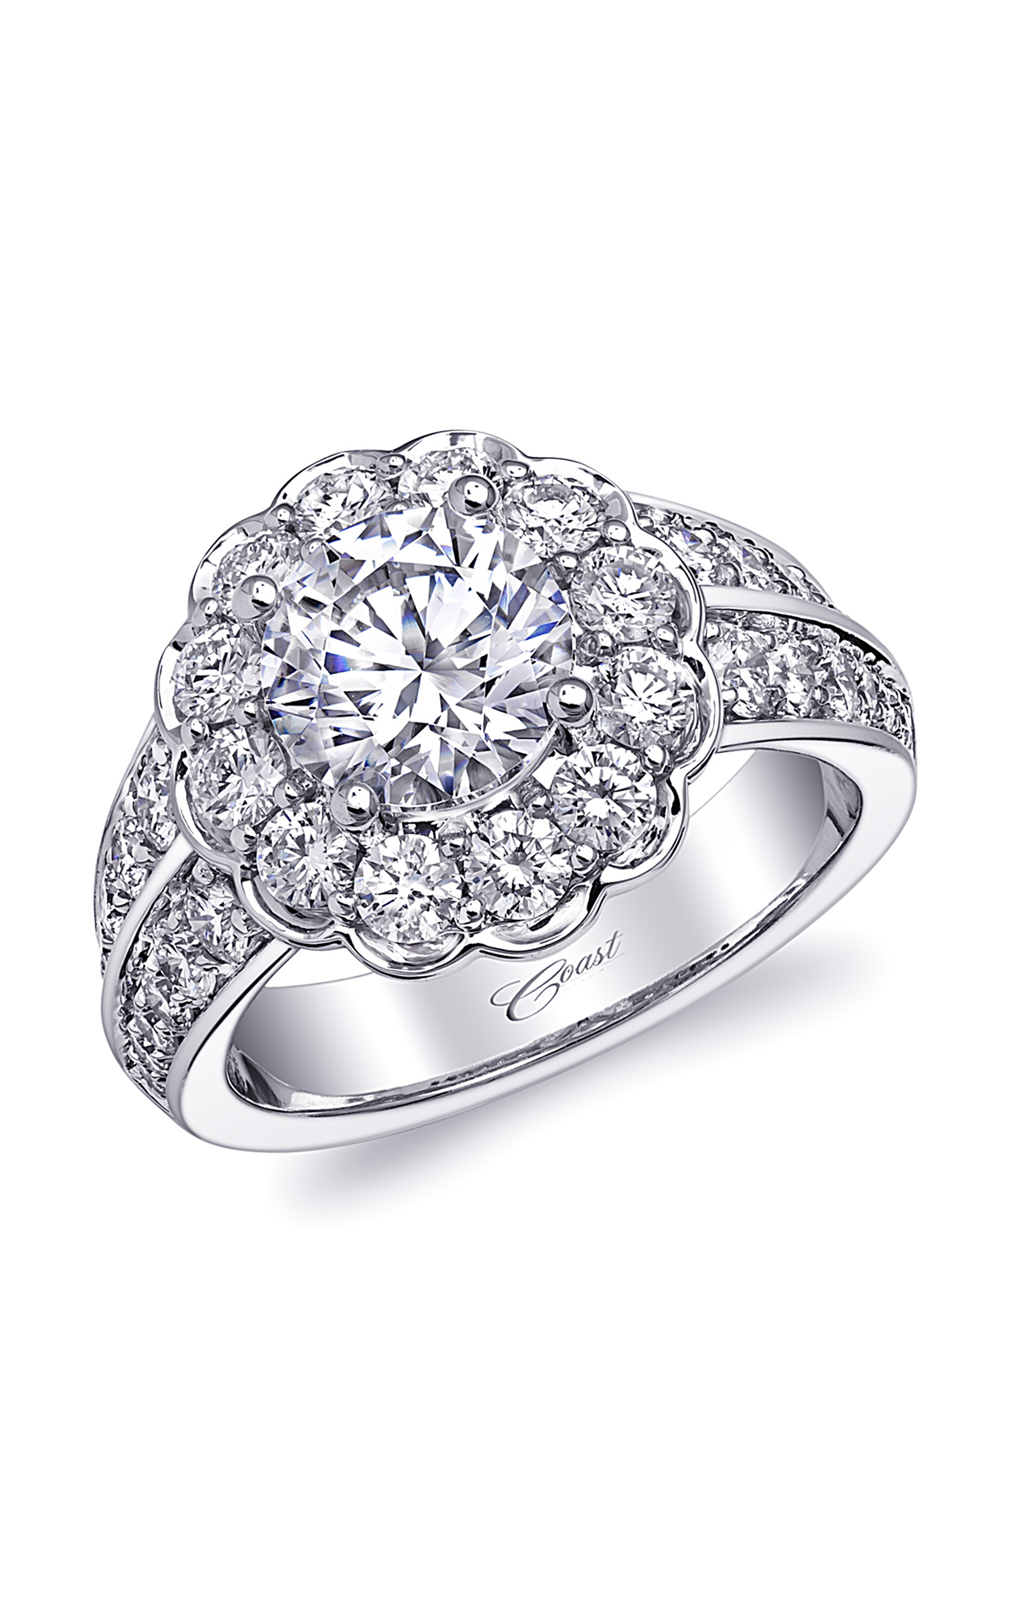 Coast Diamond Romance LS10152 product image